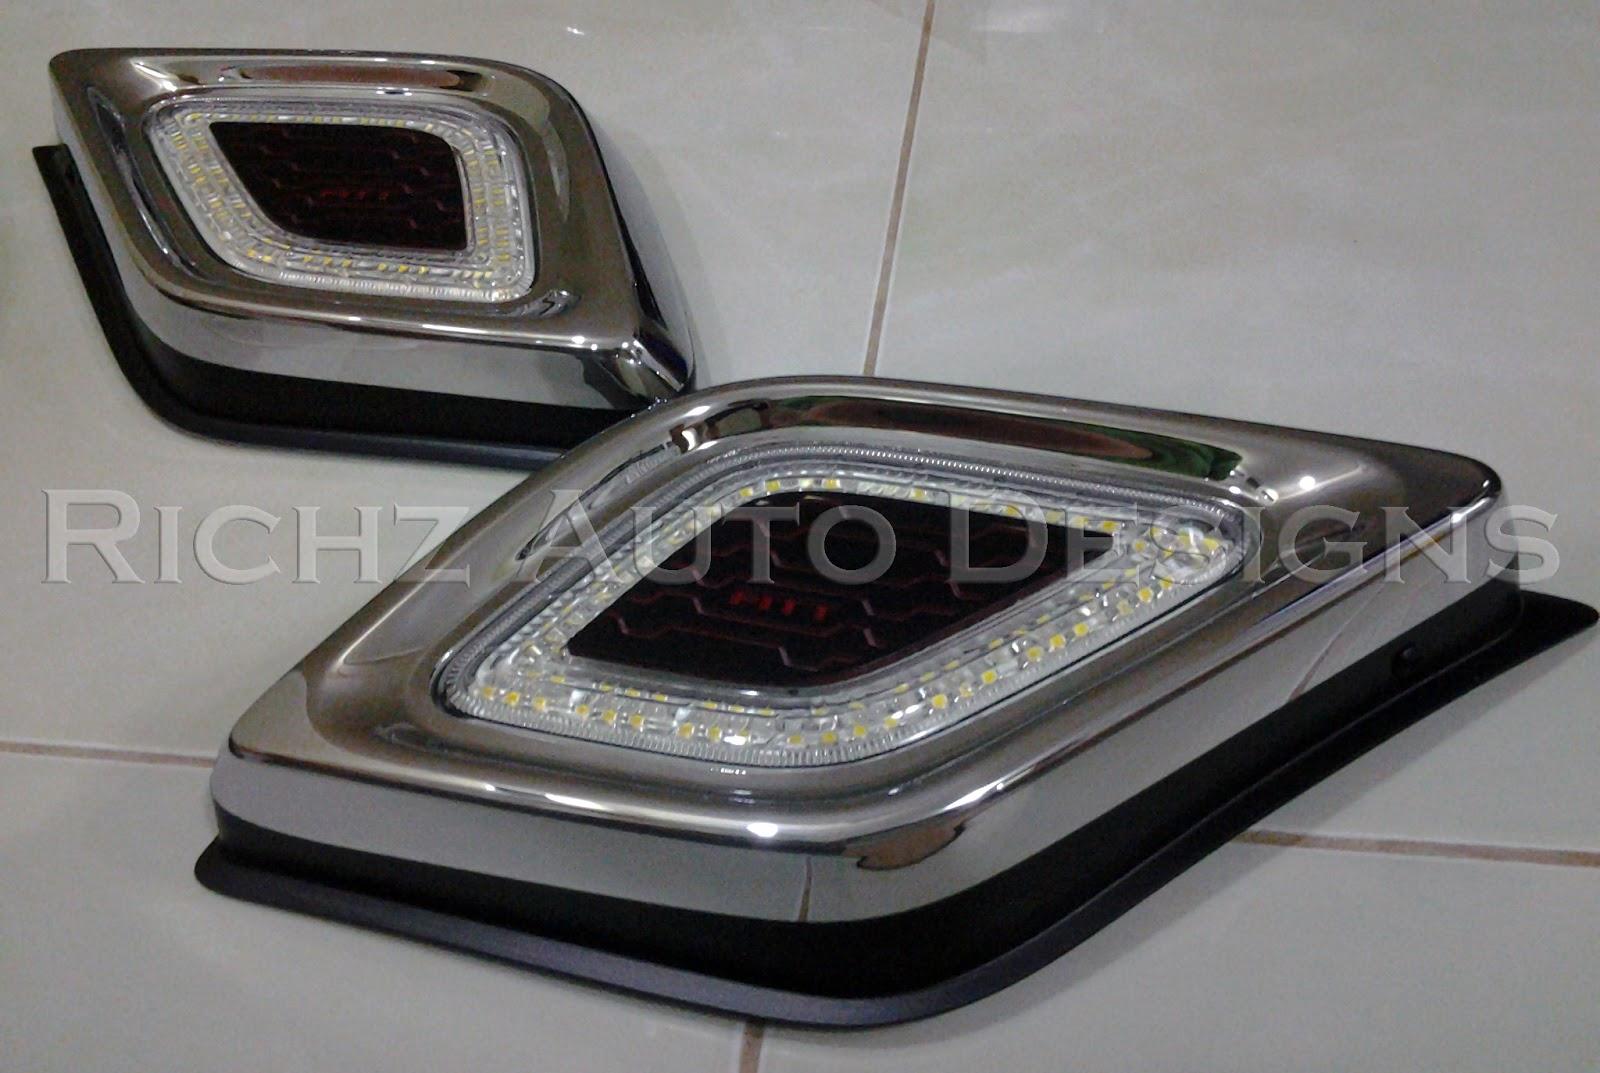 Bodykit Grand New Veloz Velg Oem Richz Auto Designs: Car Lightning & Foglamp